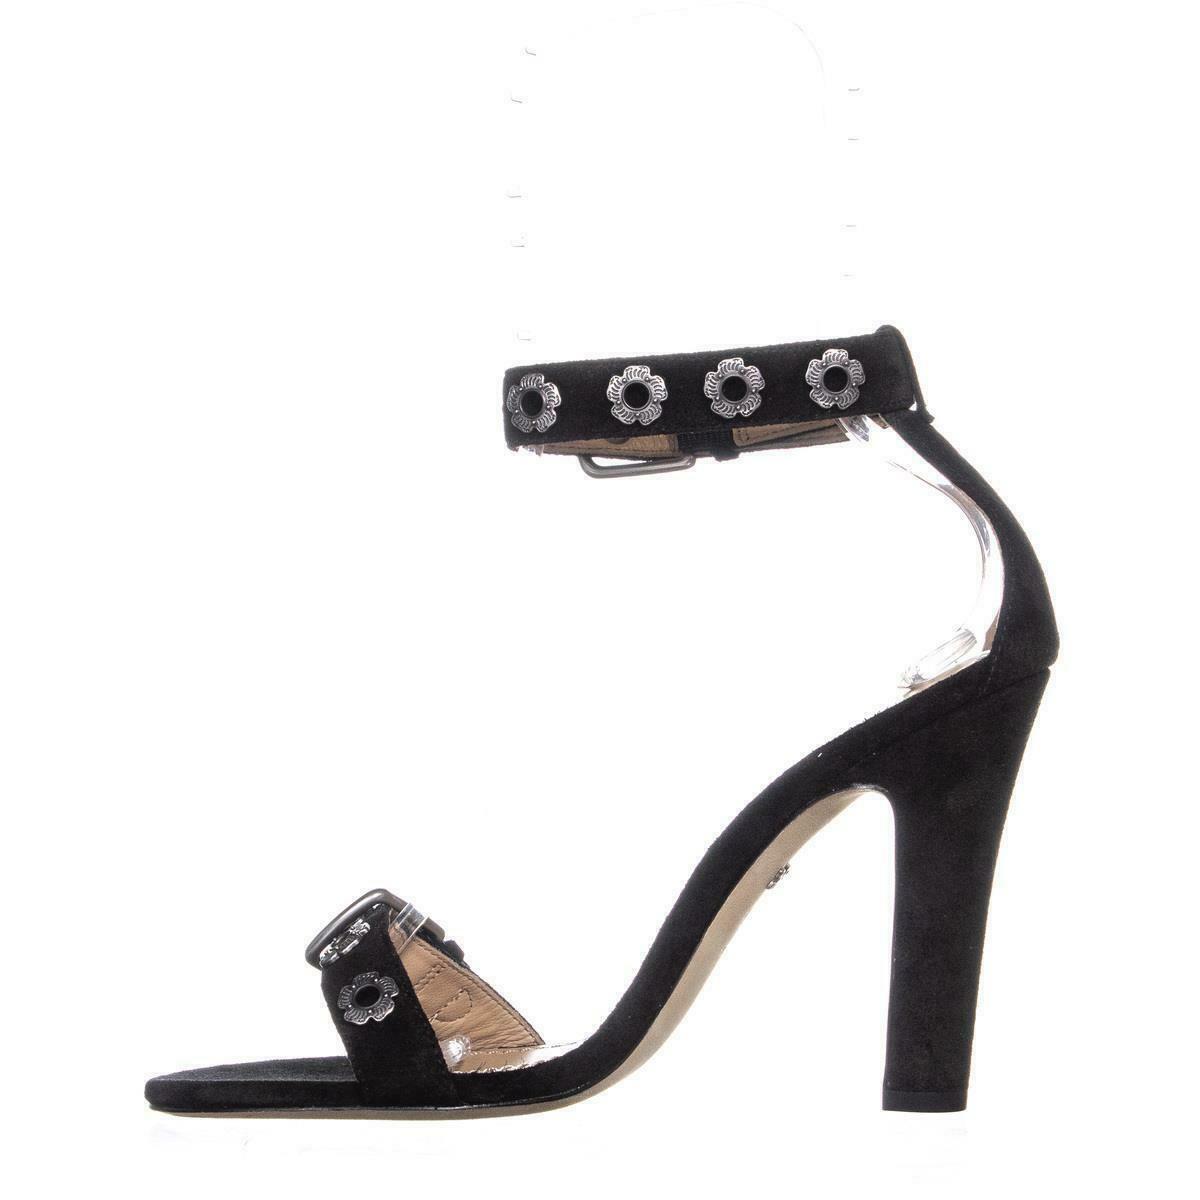 Coach Elizabeth102 Ankle Strap Sandals, Black image 3